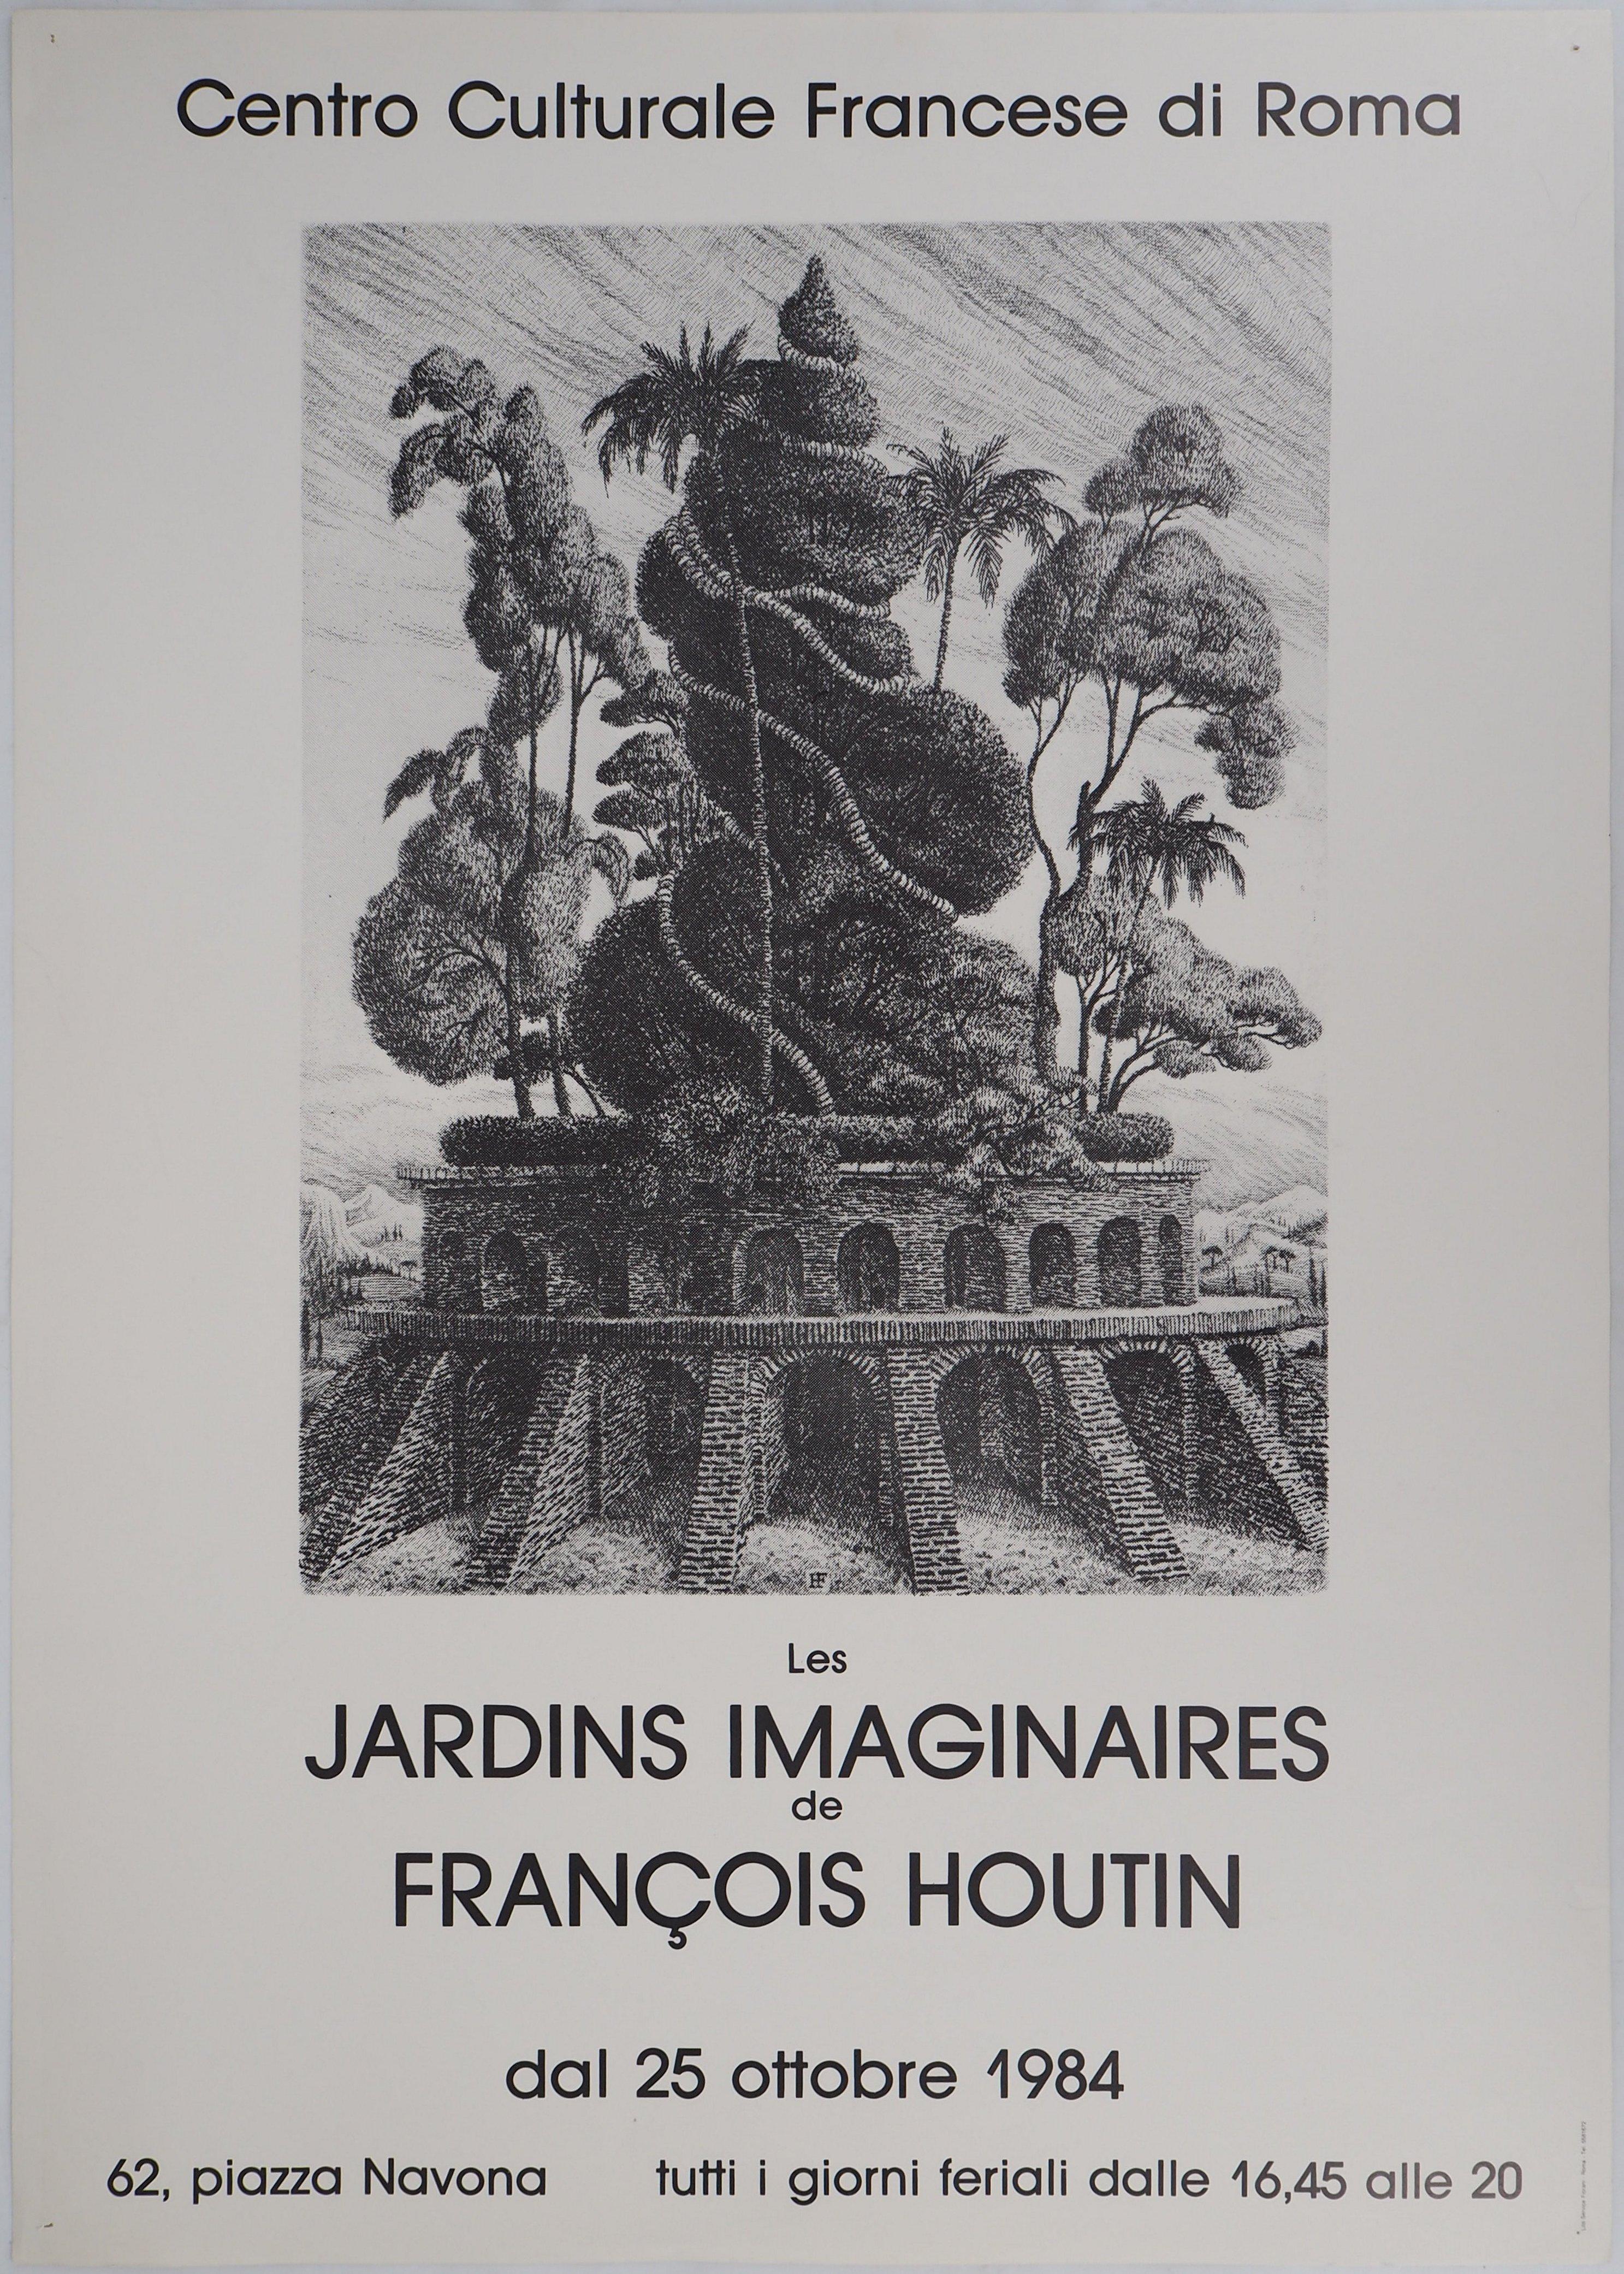 Comme Votre Maison Roma françois houtin - the imaginary gardens, 1984 - original